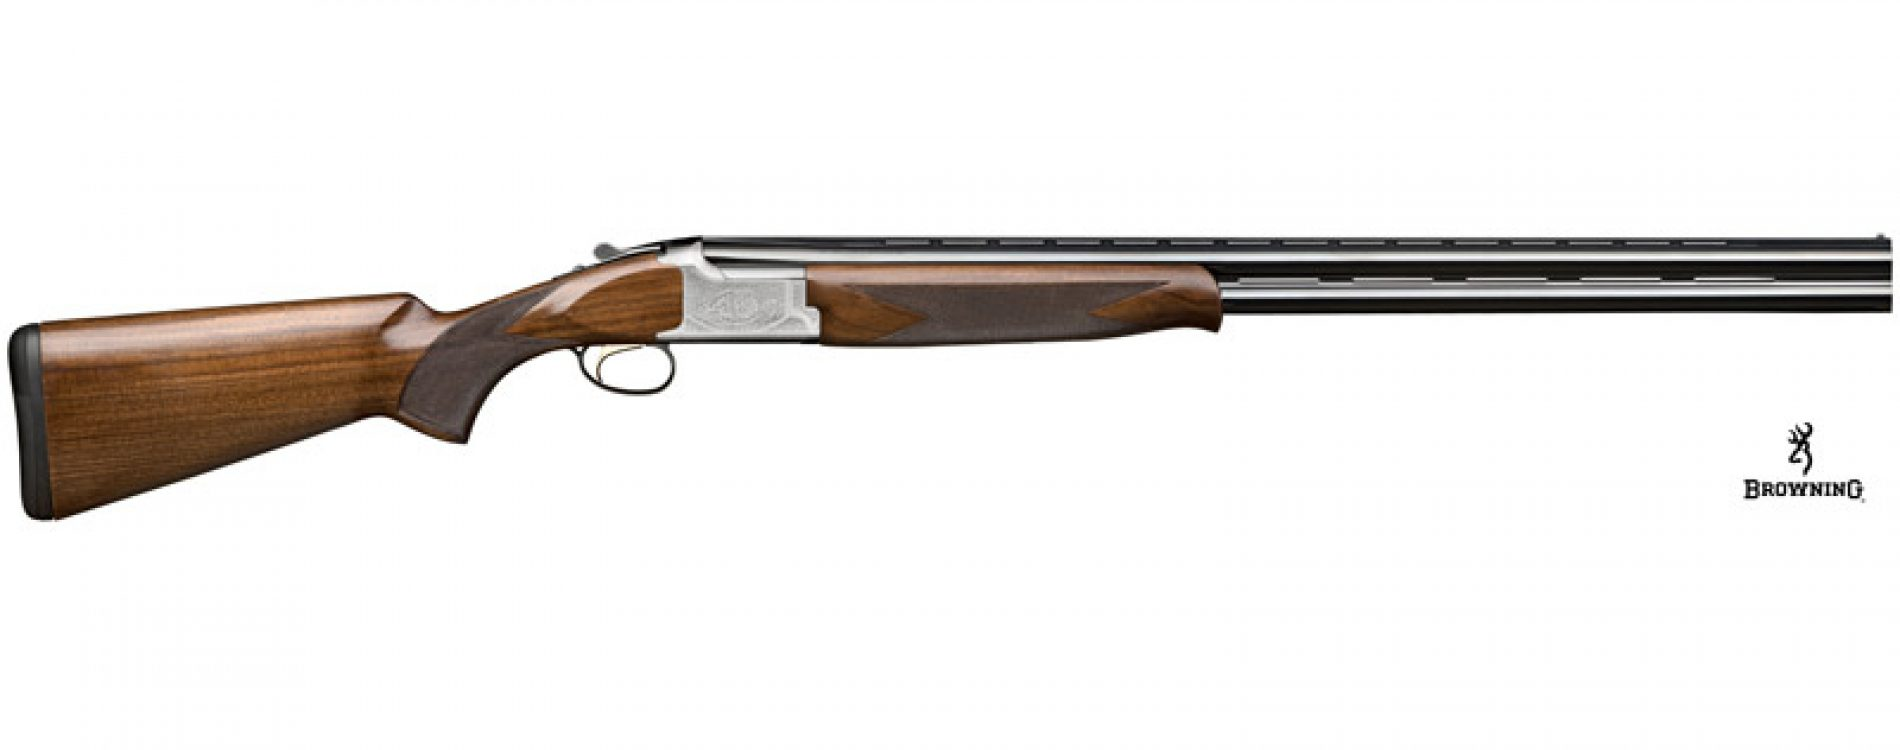 Escopeta superpuesta B525 Sporter One calibre 12